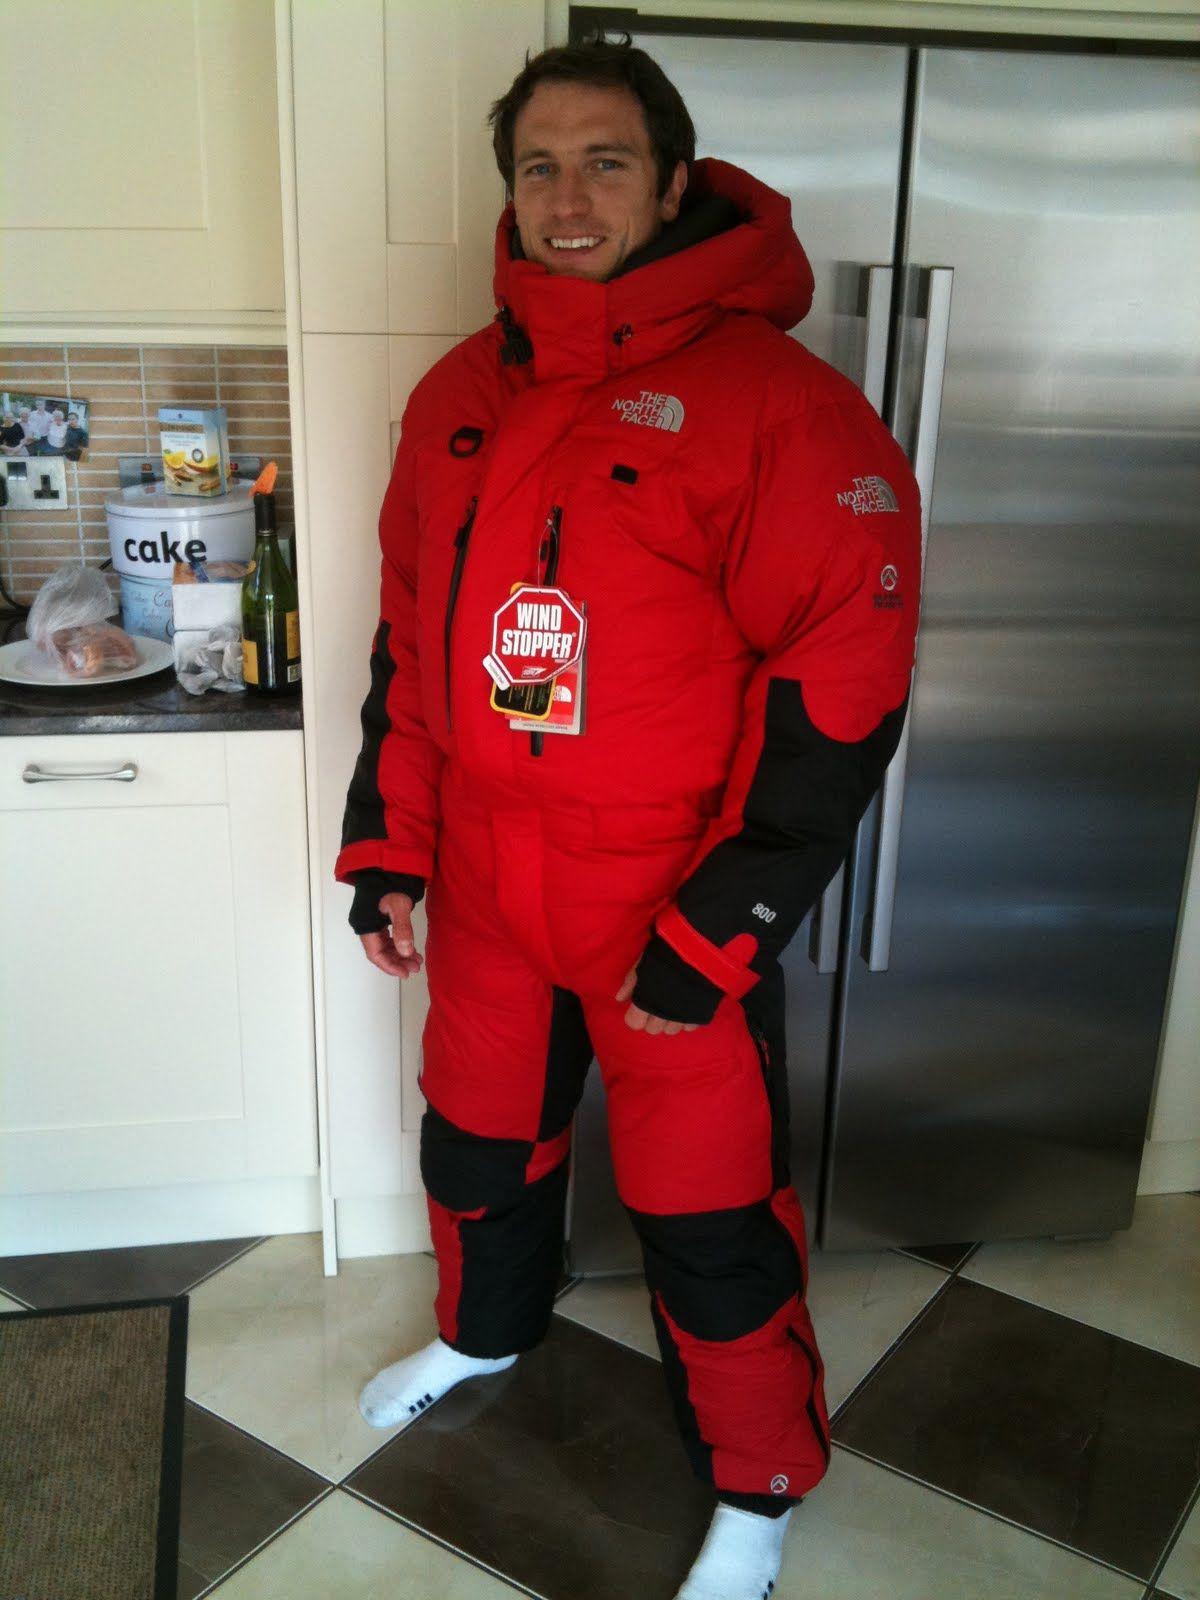 Arrival of summit suit suits supreme clothing down suit